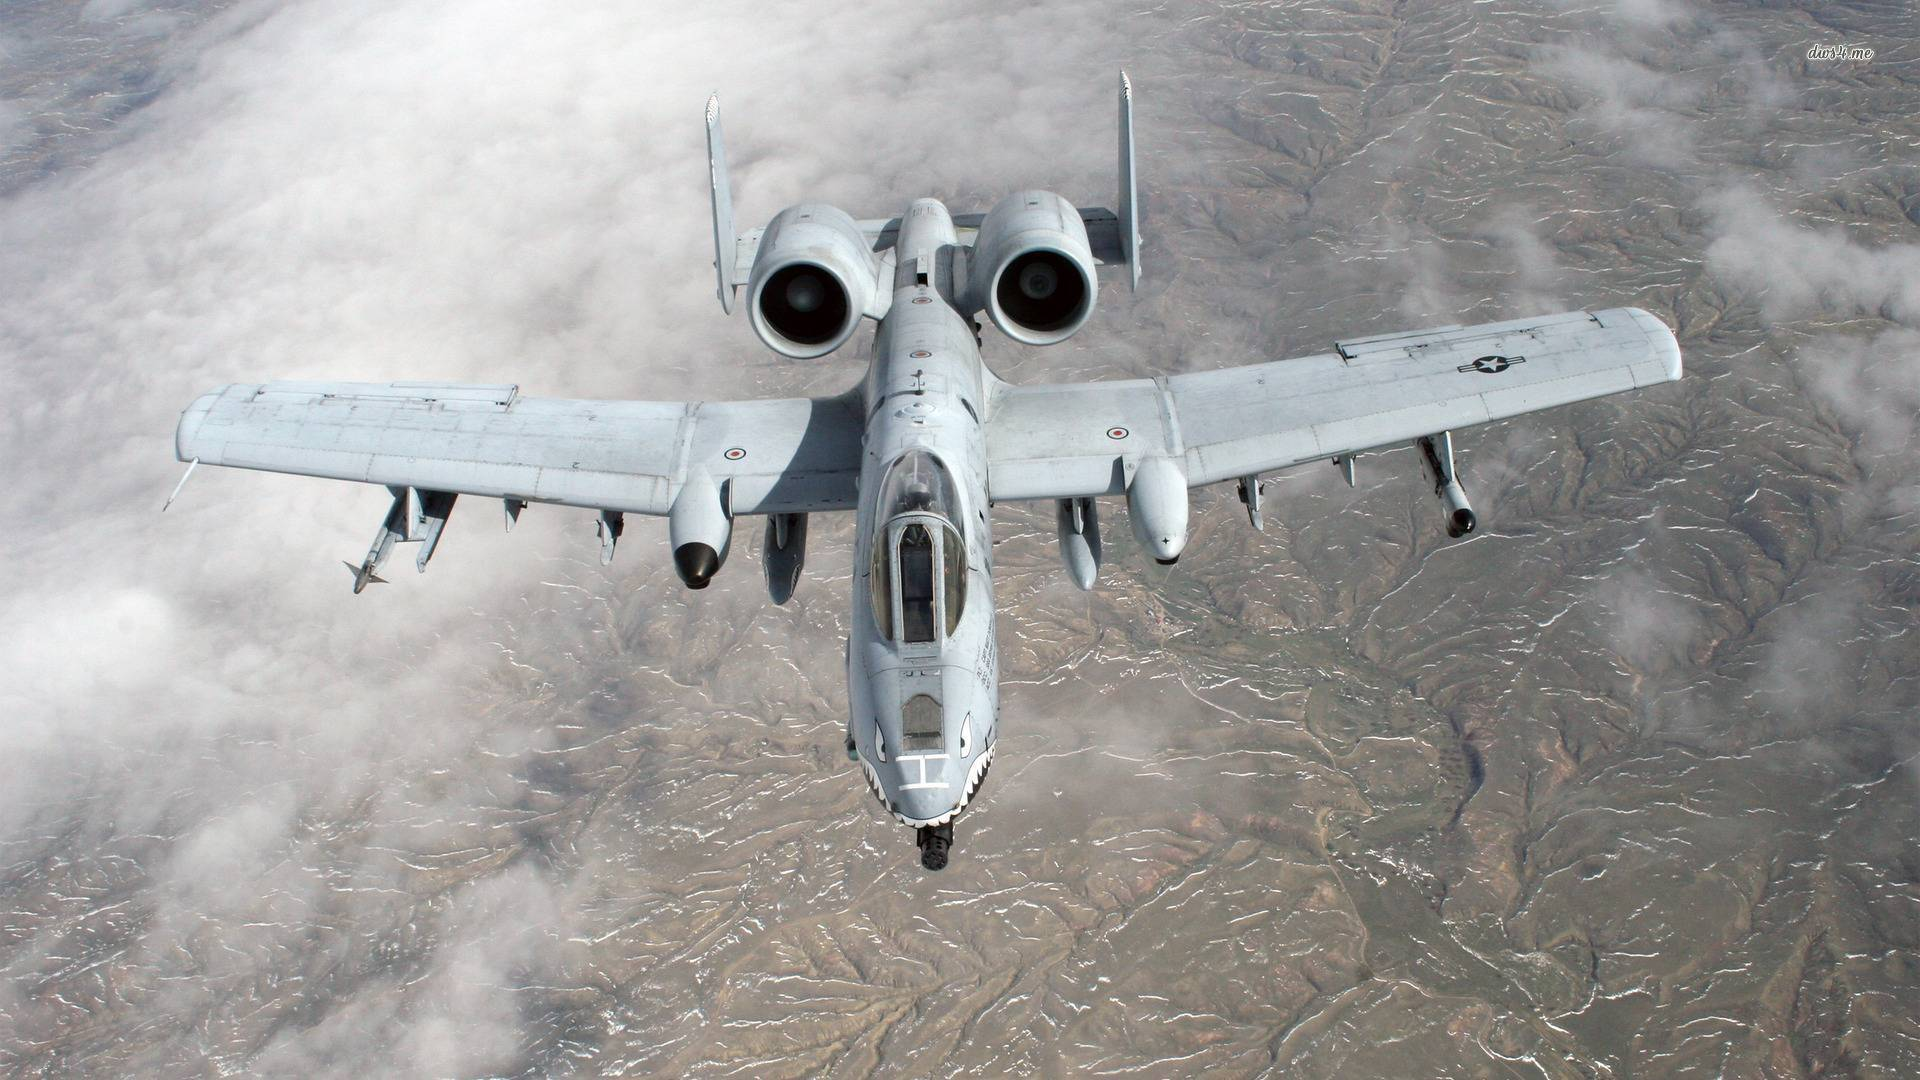 Fairchild a-10 thunderbolt ii. фото. видео. характеристики.